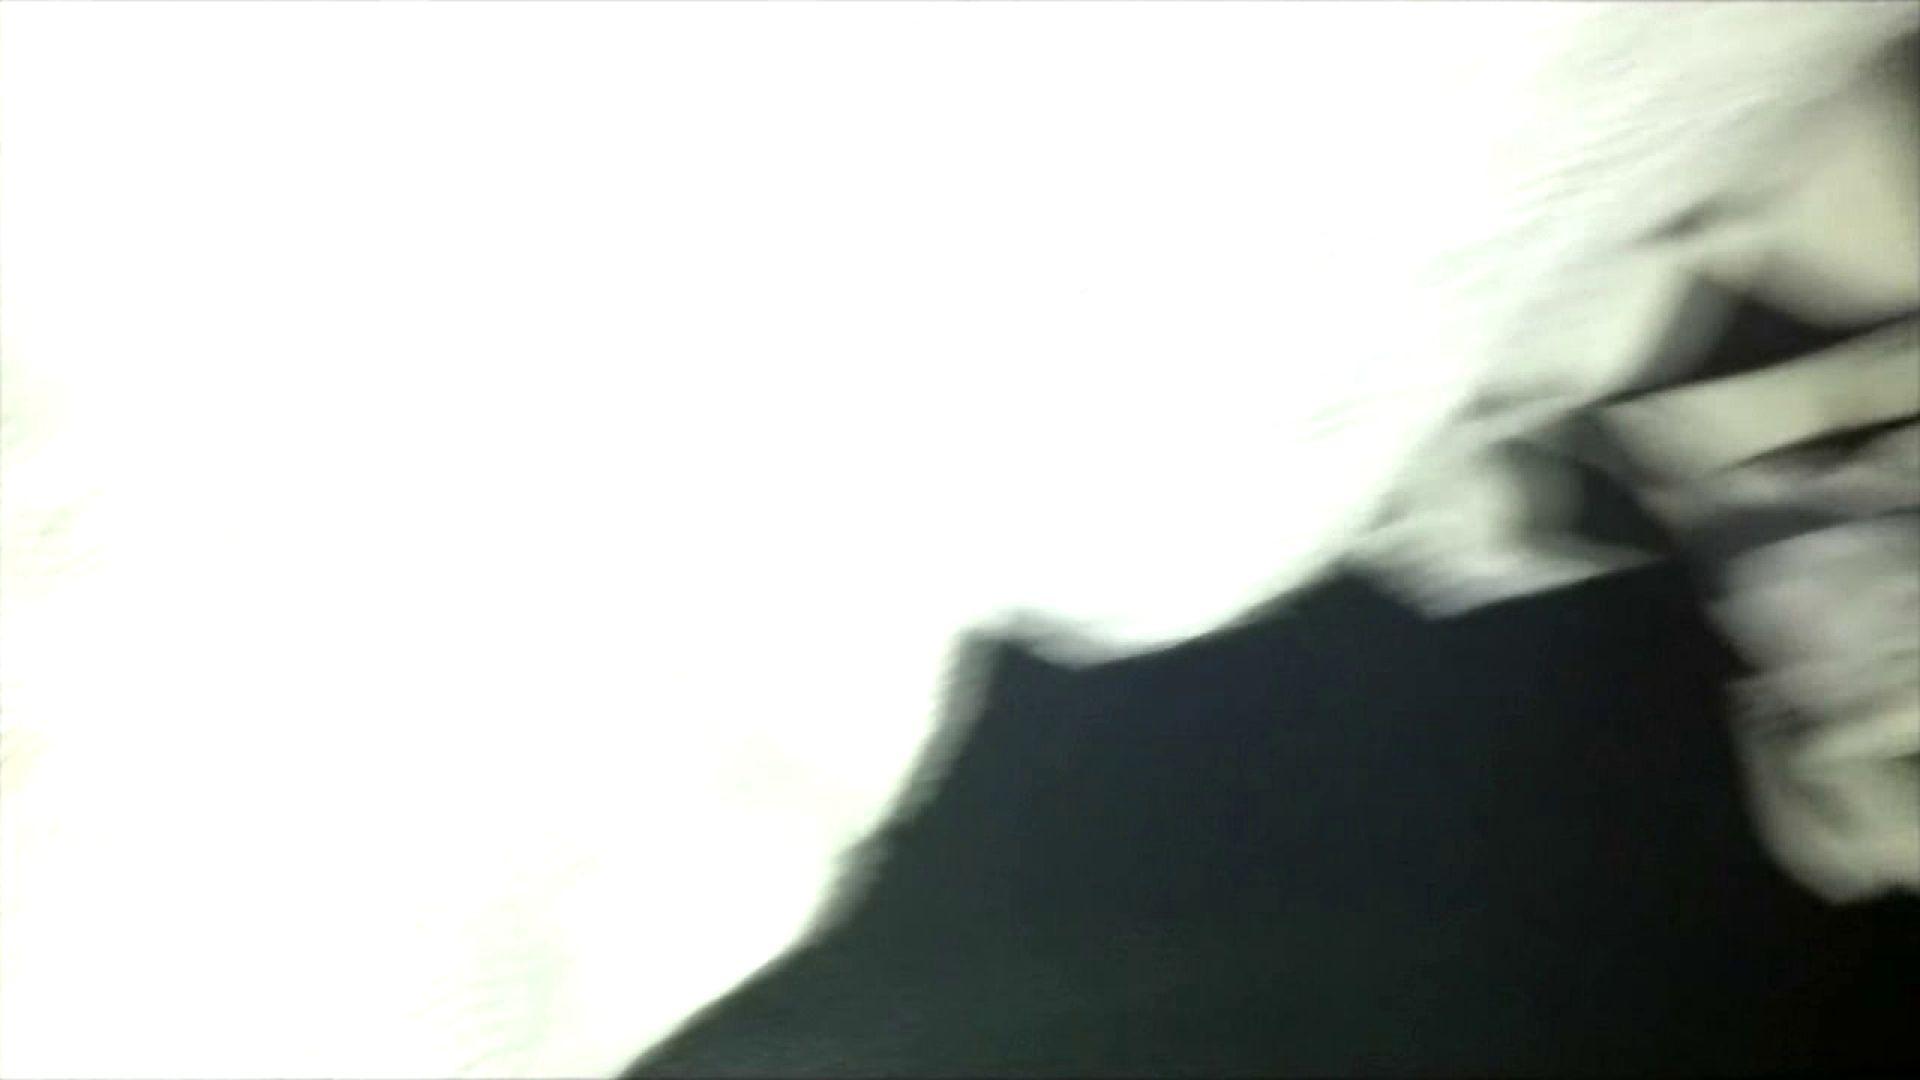 vol.14 【Yuiちゃん】ペットトリマー20歳 彼女にしたい 女子大生ハメ撮り  107Pix 90